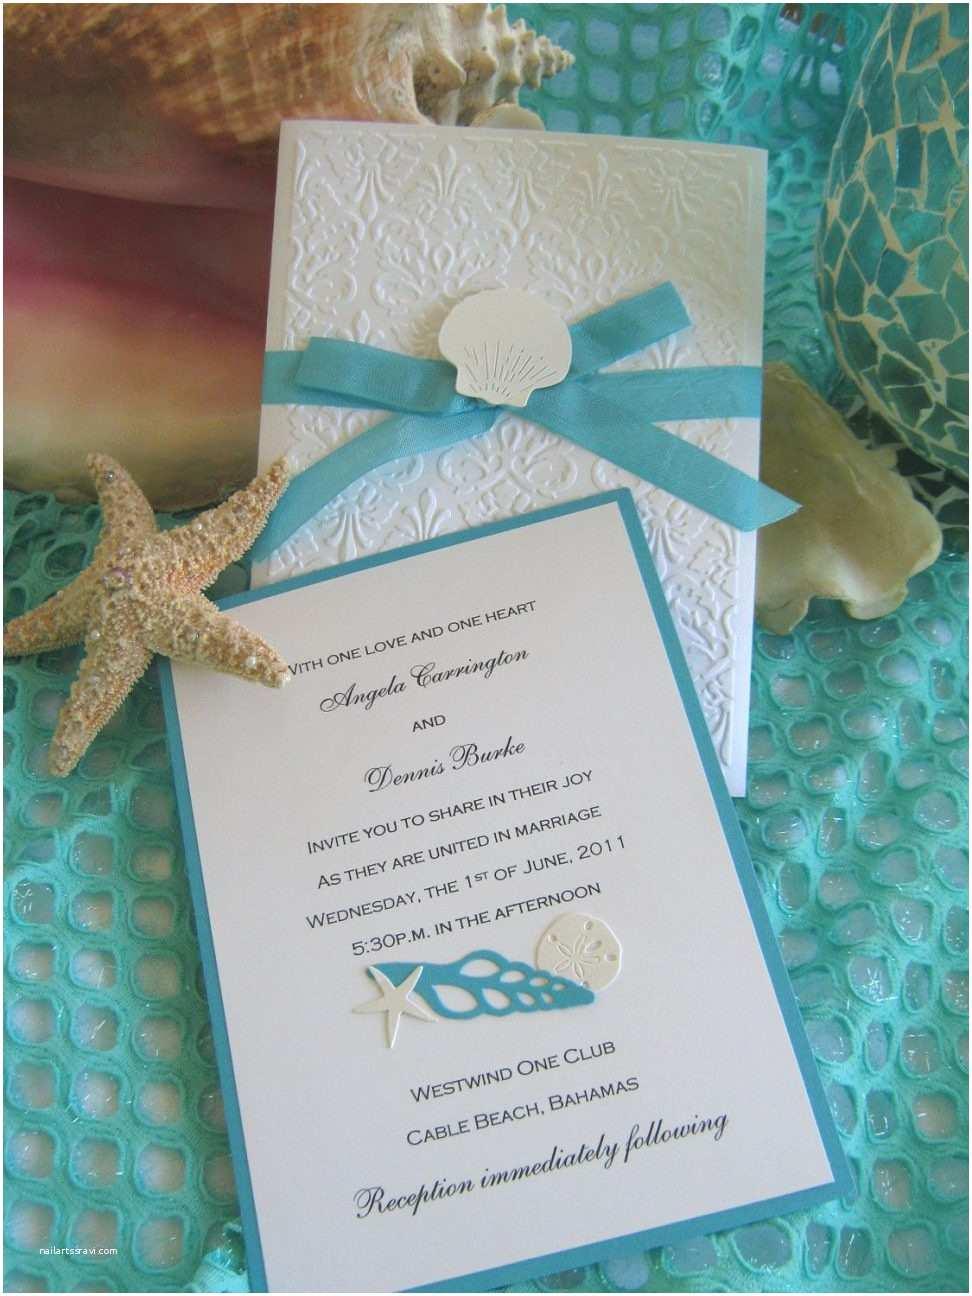 Seashell Wedding Invitations Wedding Invitation Templates Seashell Wedding Invitations